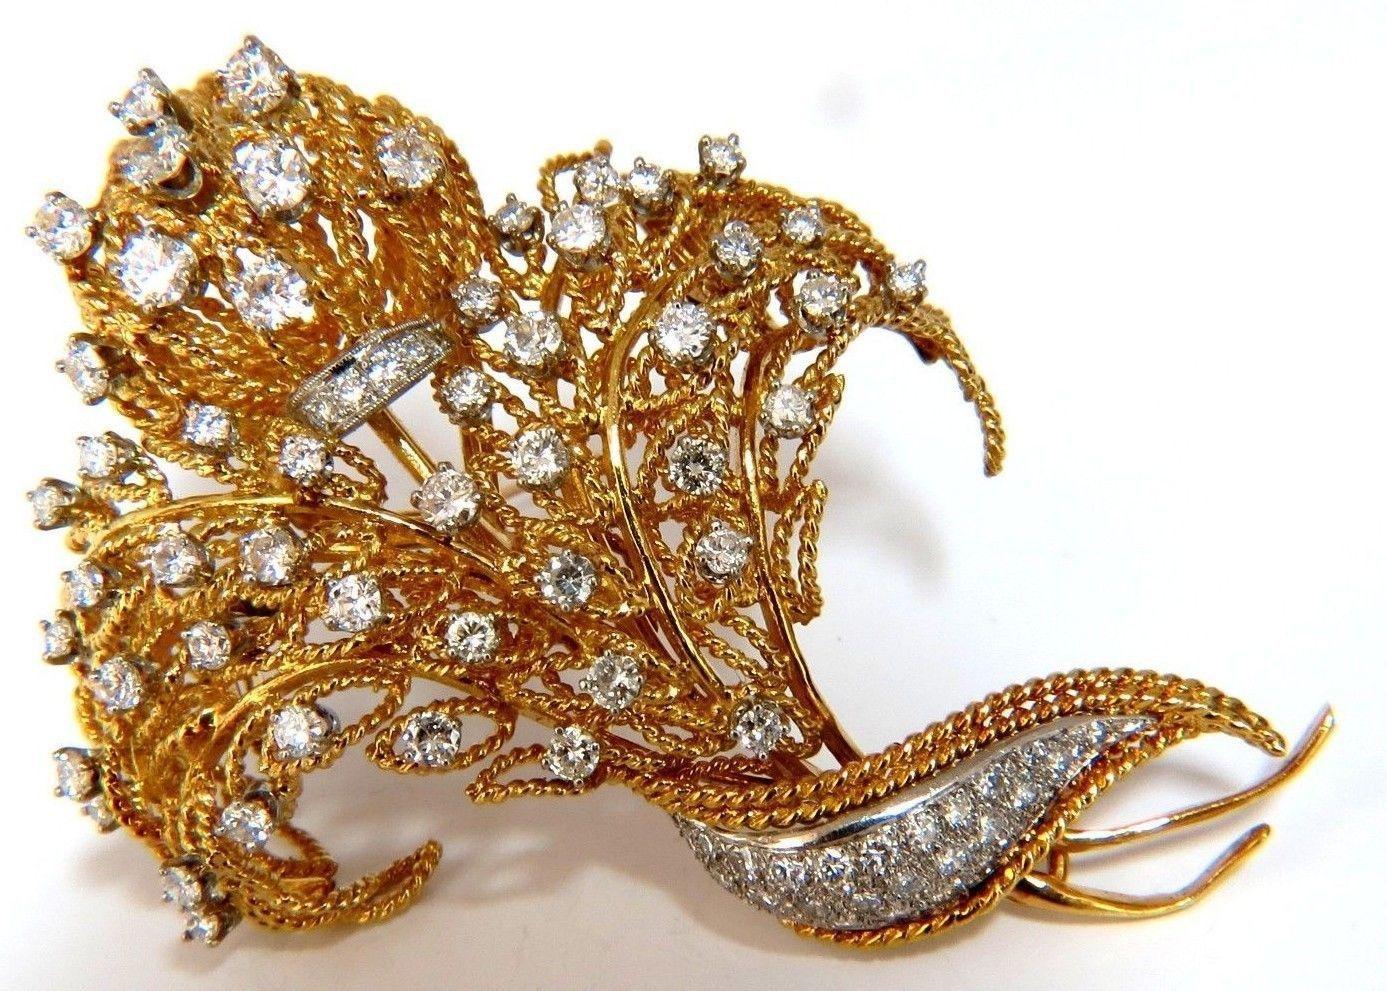 10.00ct DIAMONDS RAISED ROPE TWIST 3D DECO BUNDLE FORM PIN BROOCH 18K